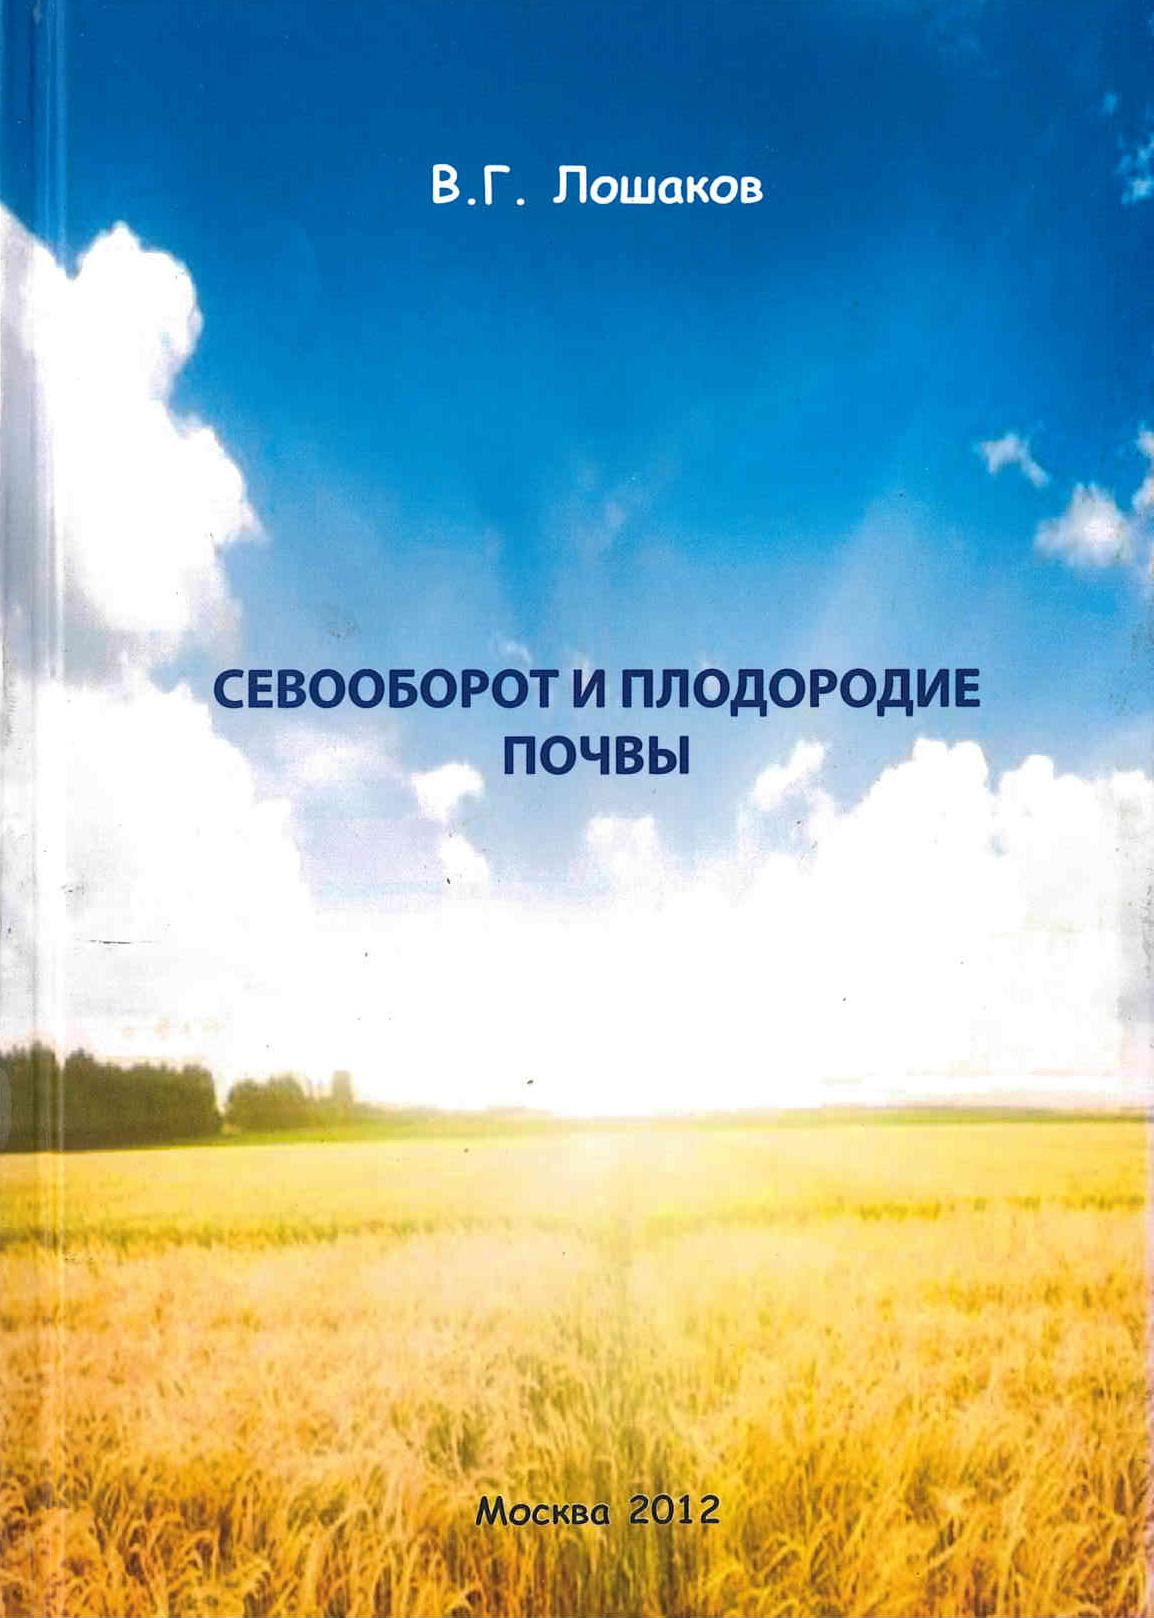 Севооборот и плодородие почвы - фото